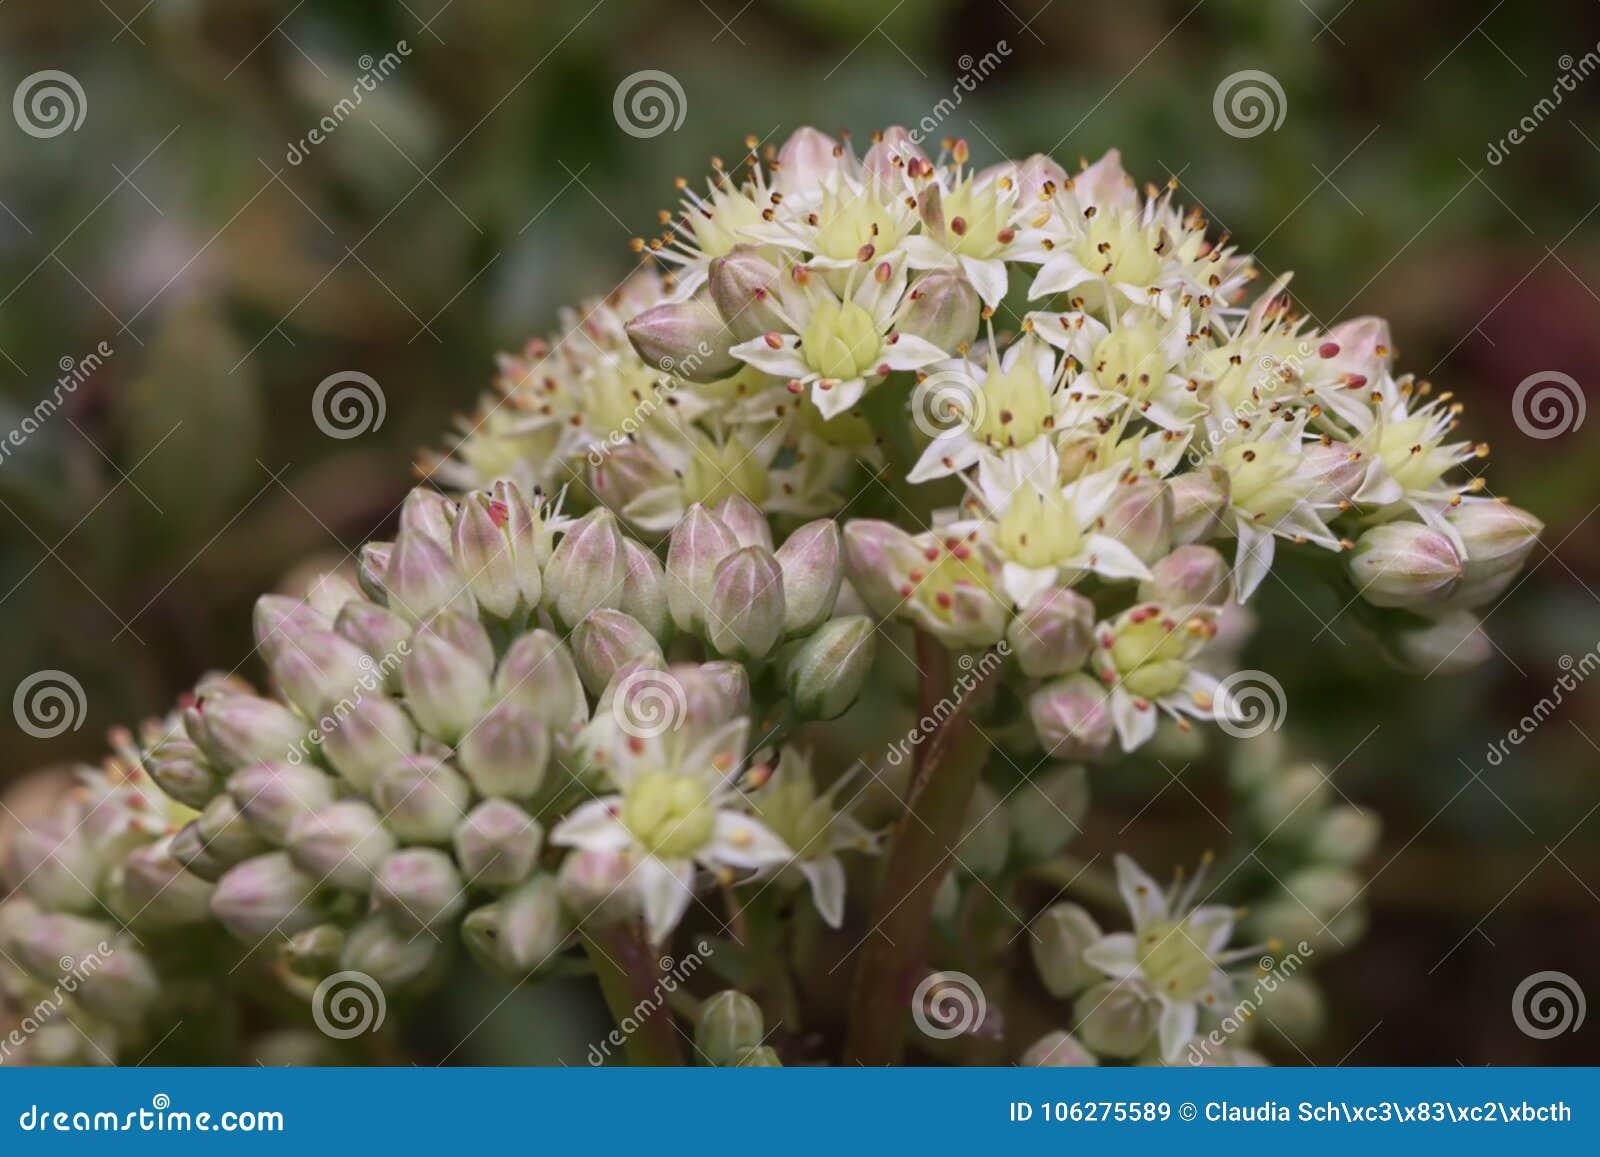 The flower umbel of an orpine Hylotelephium telephium ssp. telephium